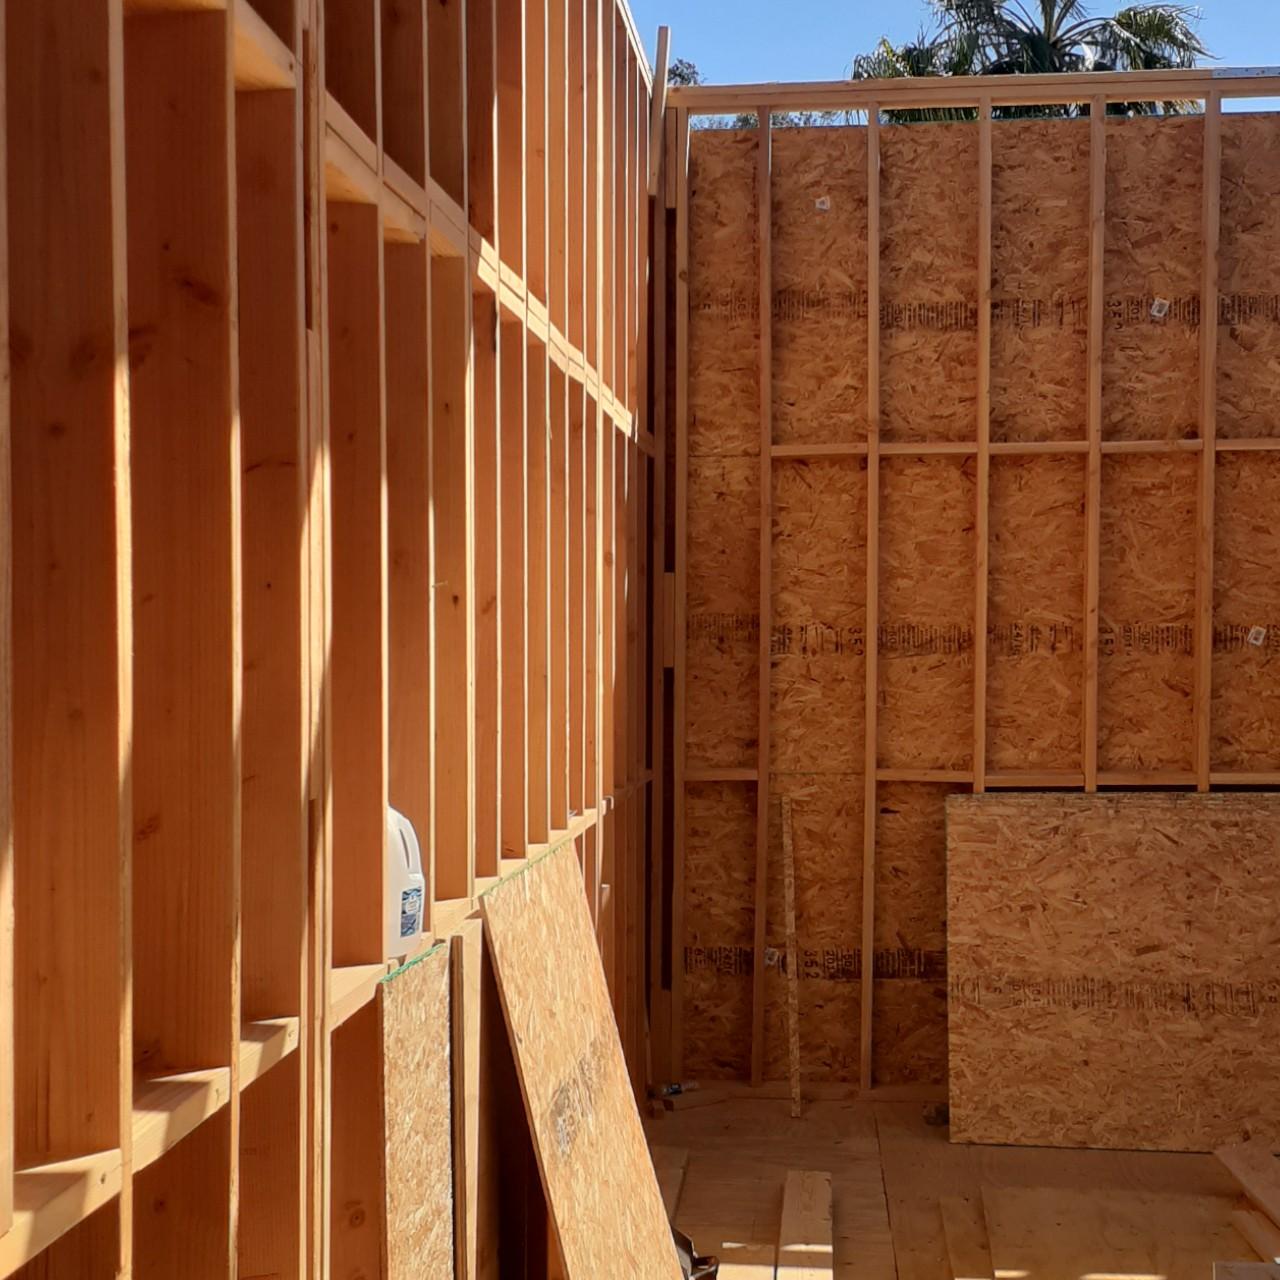 carpentry-wood-framing-second-floor-home-addition--framing-110